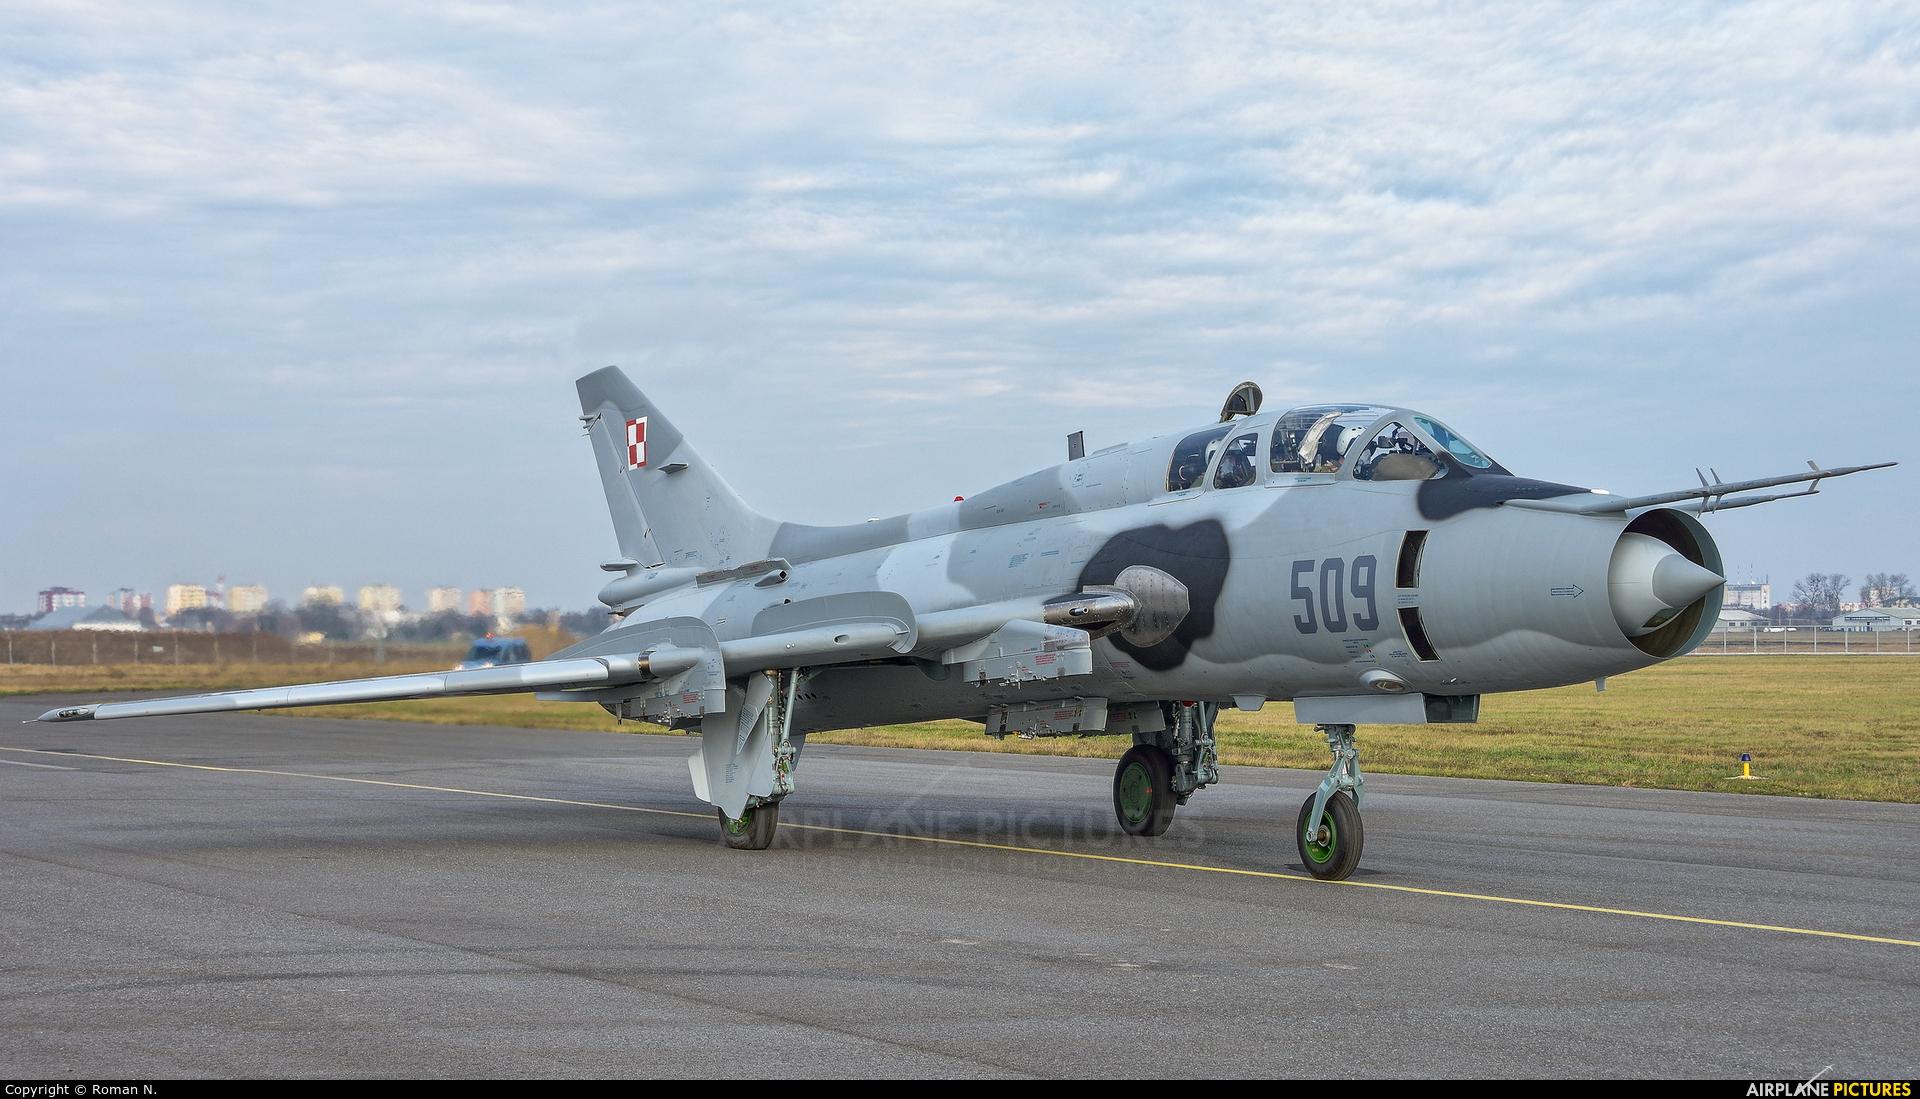 Poland - Air Force 509 aircraft at Bydgoszcz - Szwederowo